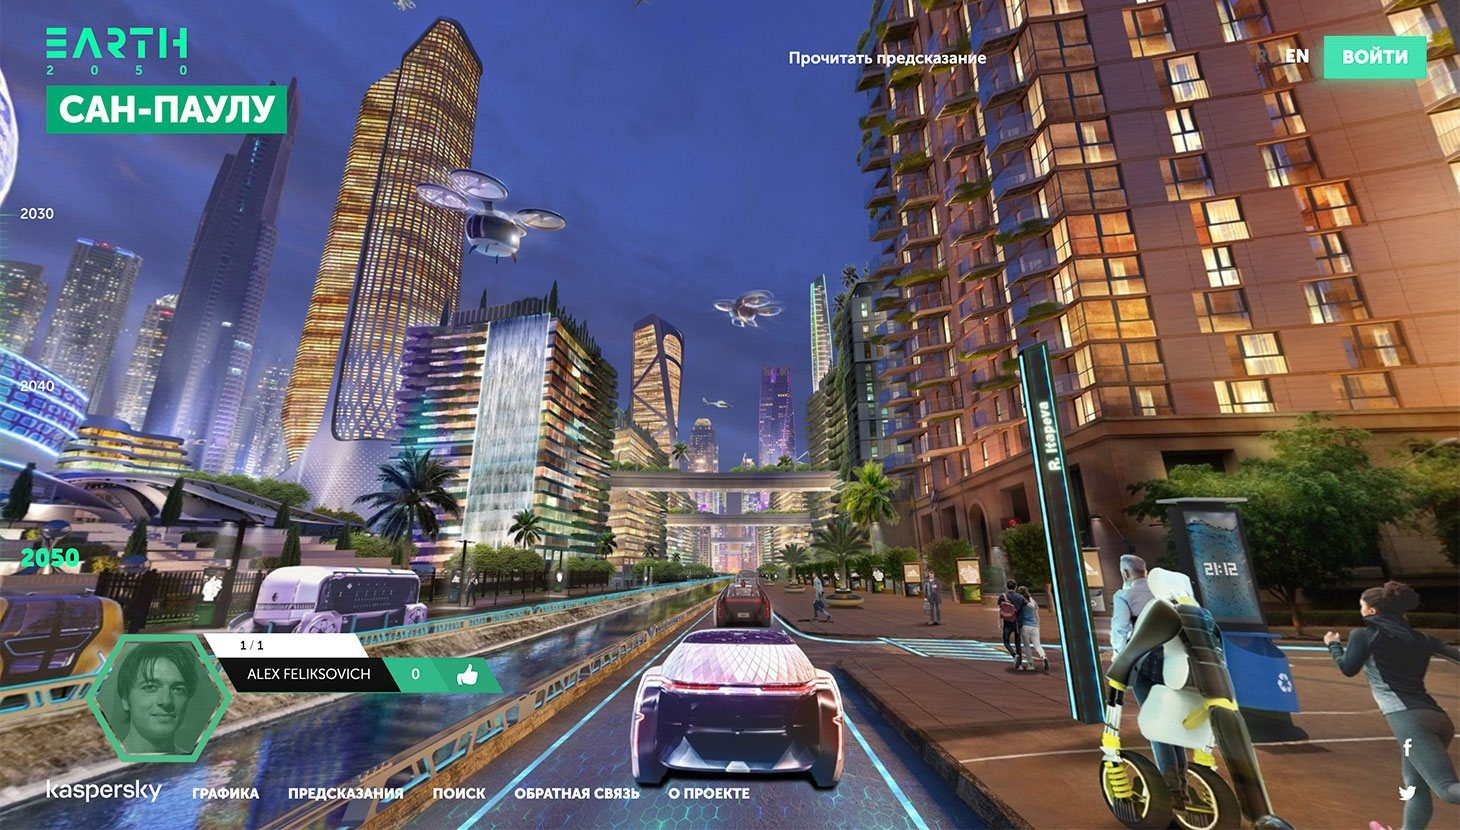 São Paulo auf Earth 2050